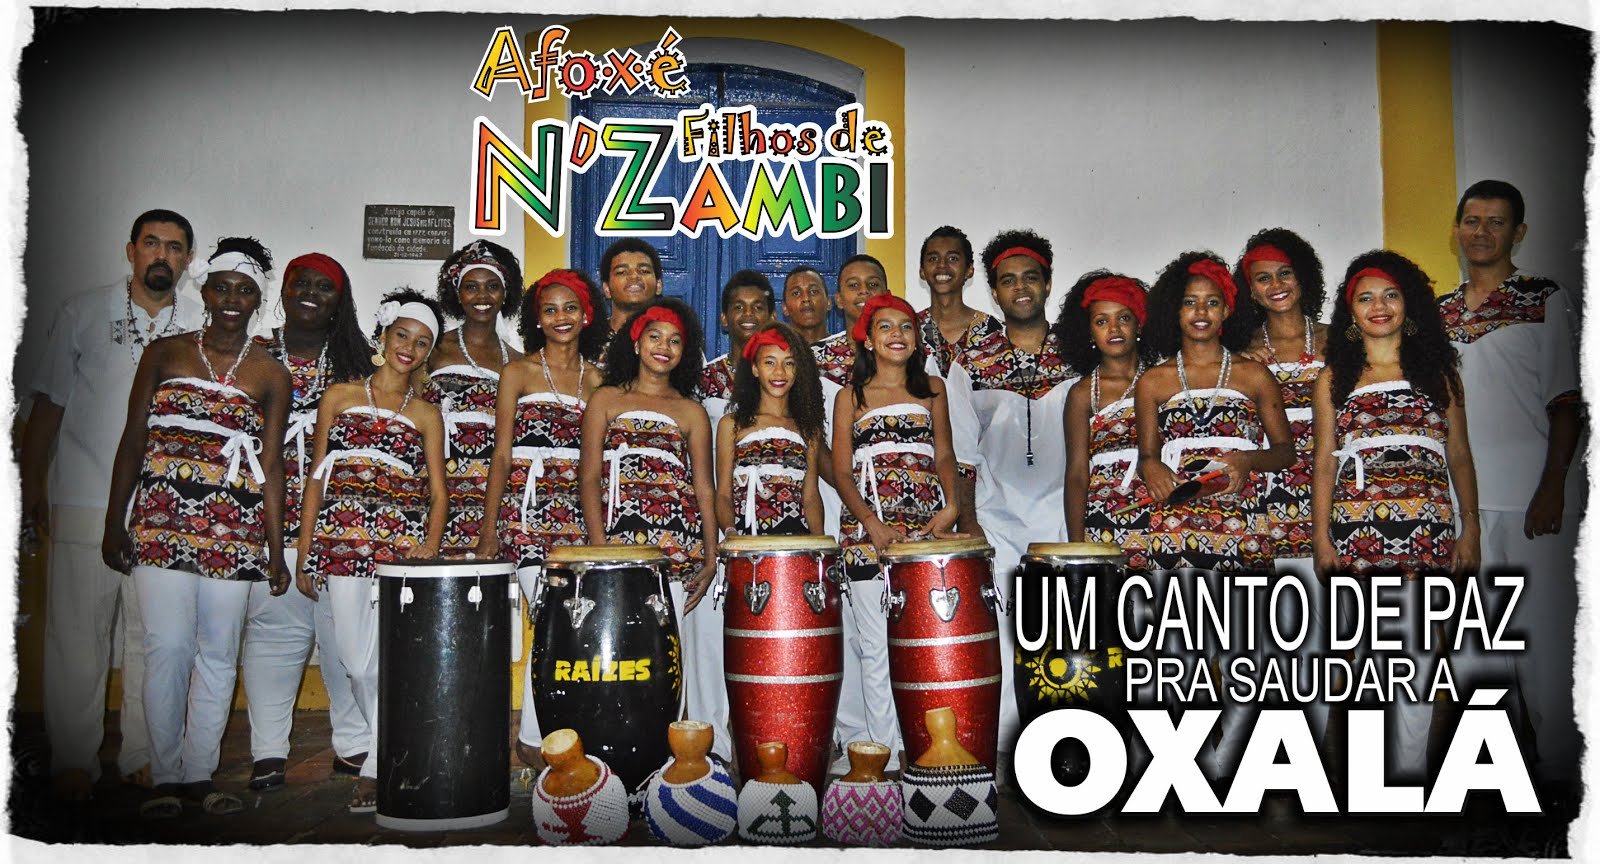 GRUPO CULTURAL AFOXÉ FILHOS DE N'ZAMBI